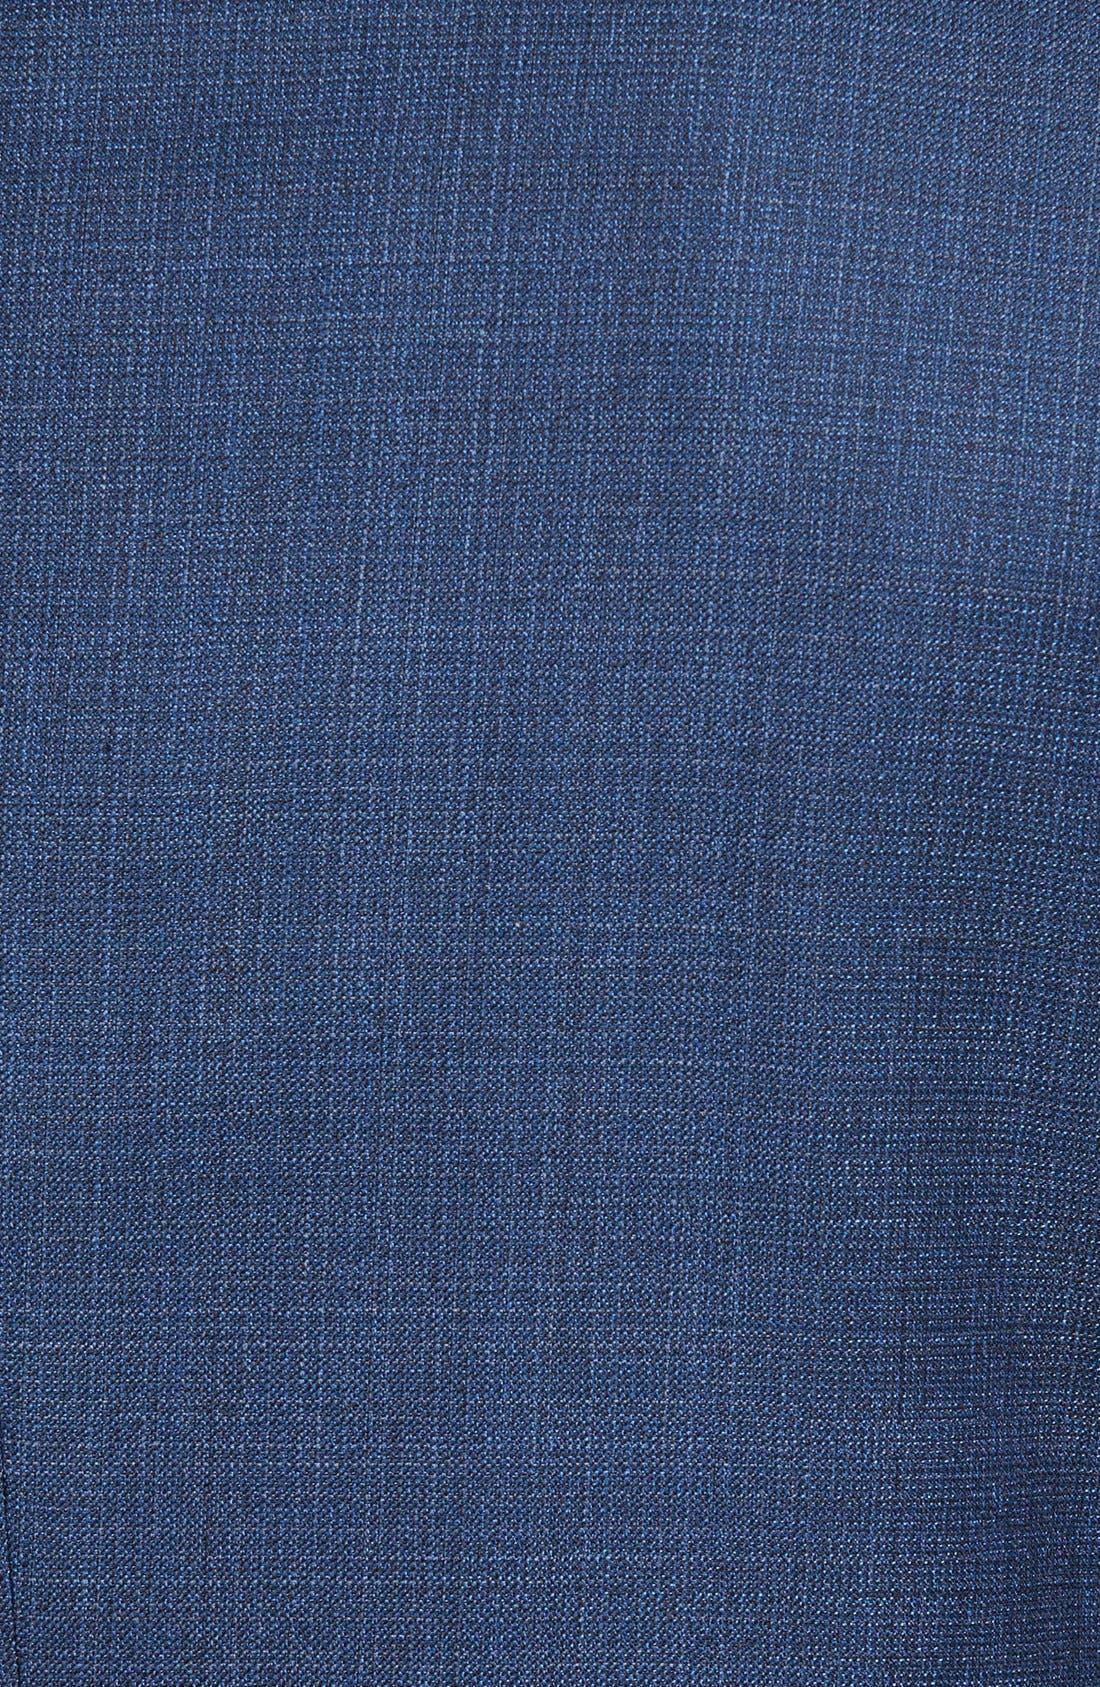 ZZDNUHUGO BOSS, BOSS 'Jeen' Trim Fit Wool Blazer, Alternate thumbnail 4, color, 420